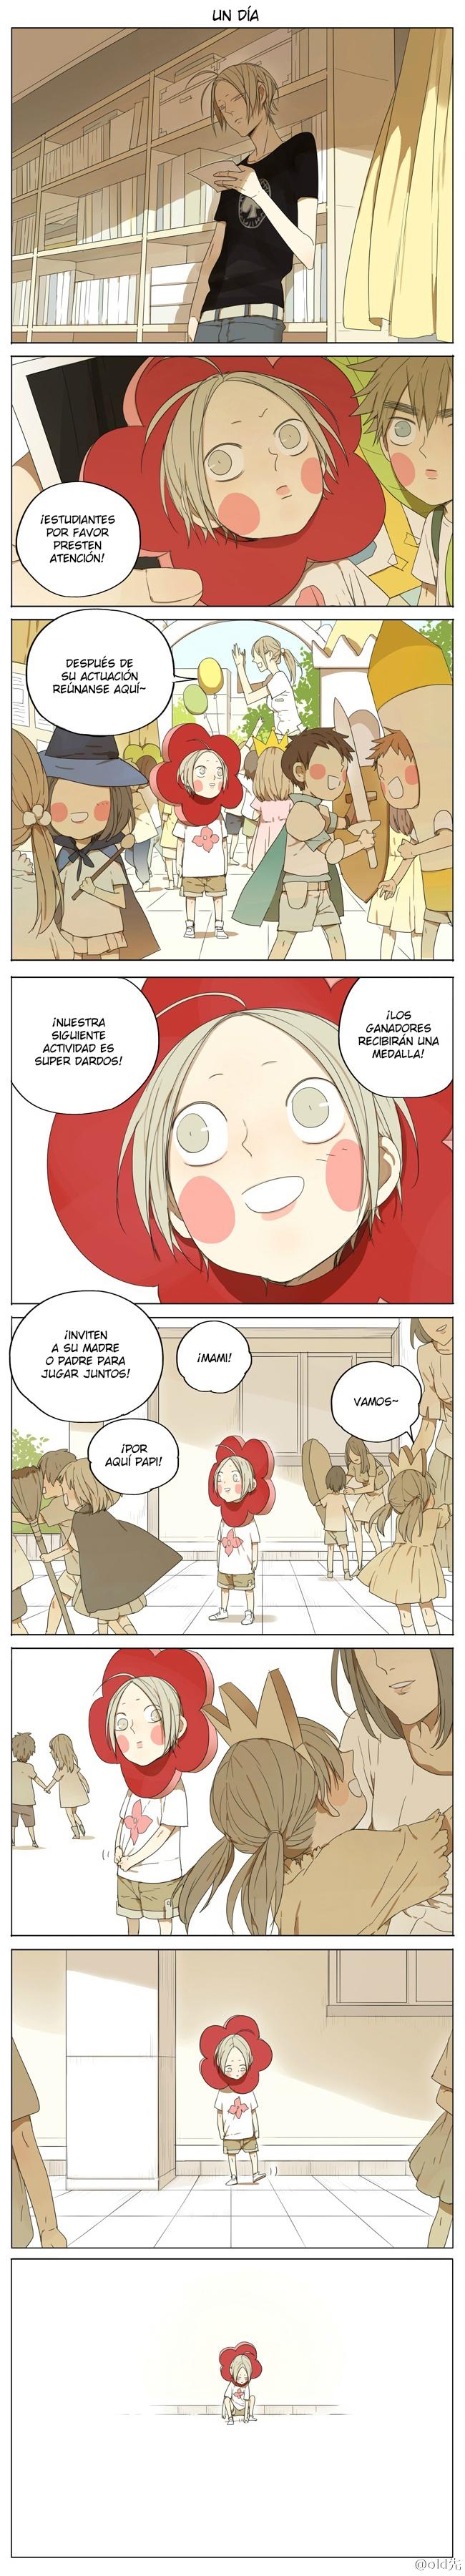 https://c5.ninemanga.com/es_manga/7/15943/381022/309e3fb6c98132ad9065bbadfe5c2319.jpg Page 15